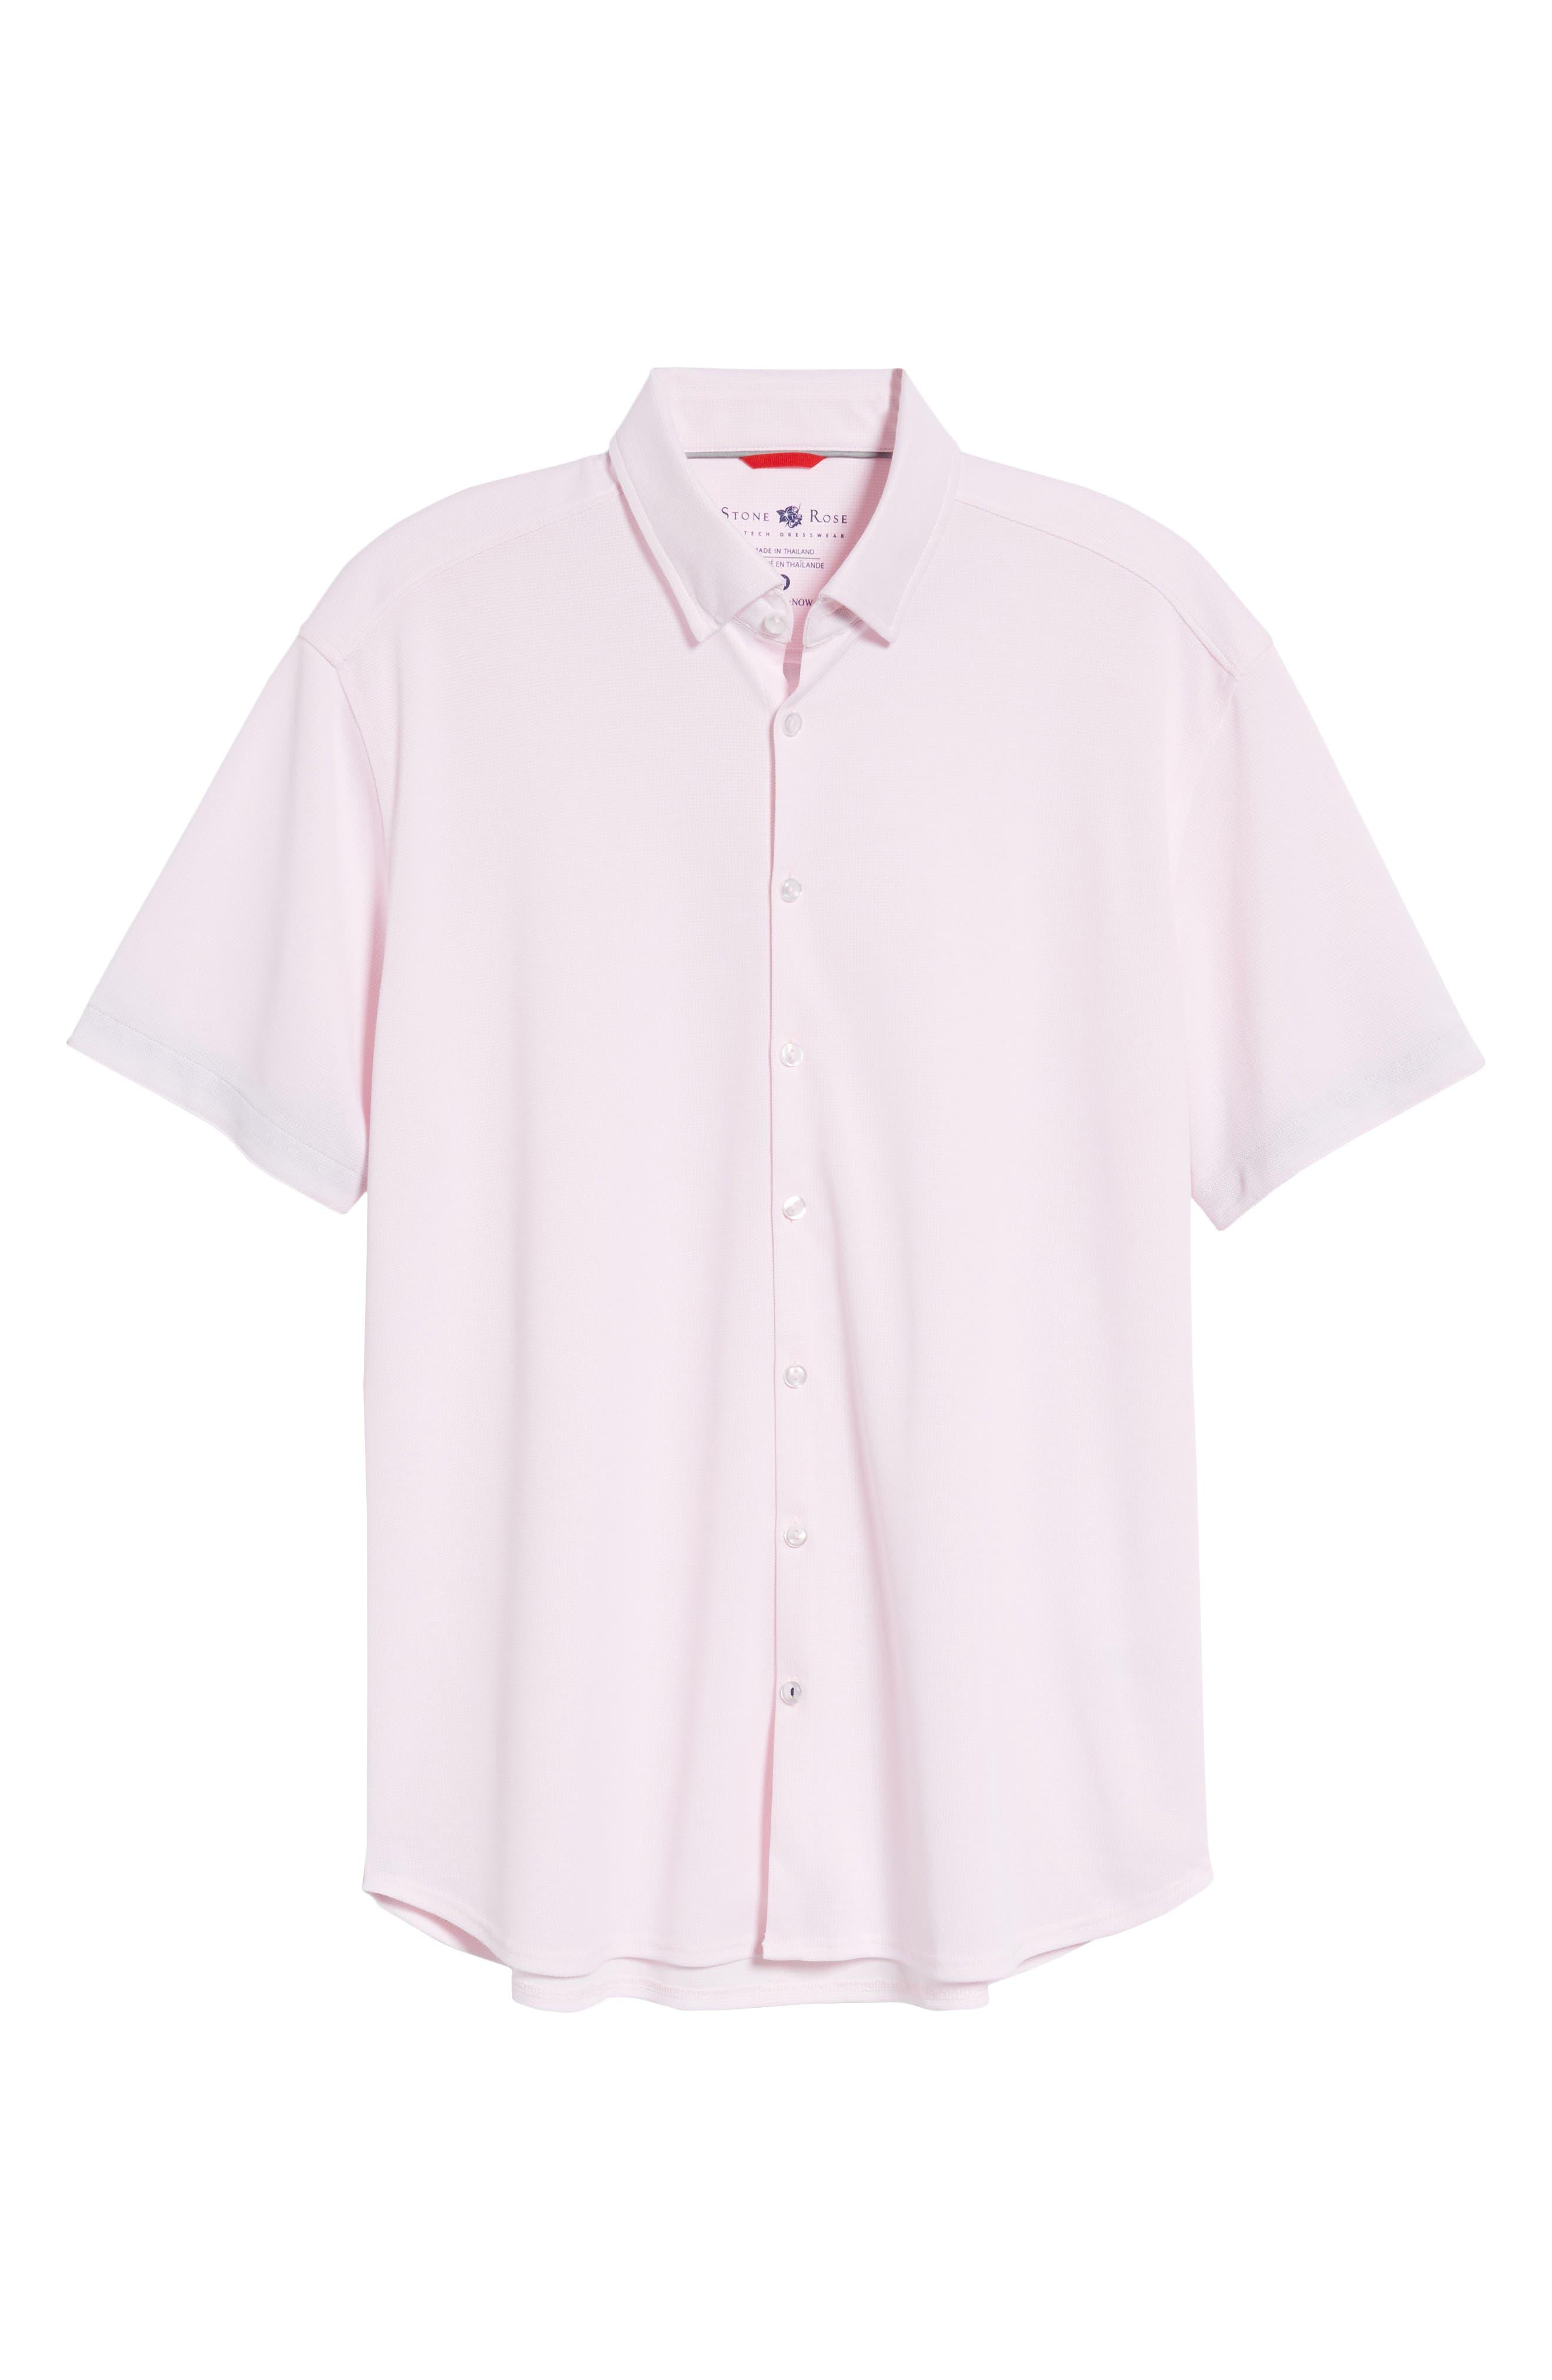 Knit Sport Shirt,                             Alternate thumbnail 6, color,                             Pink